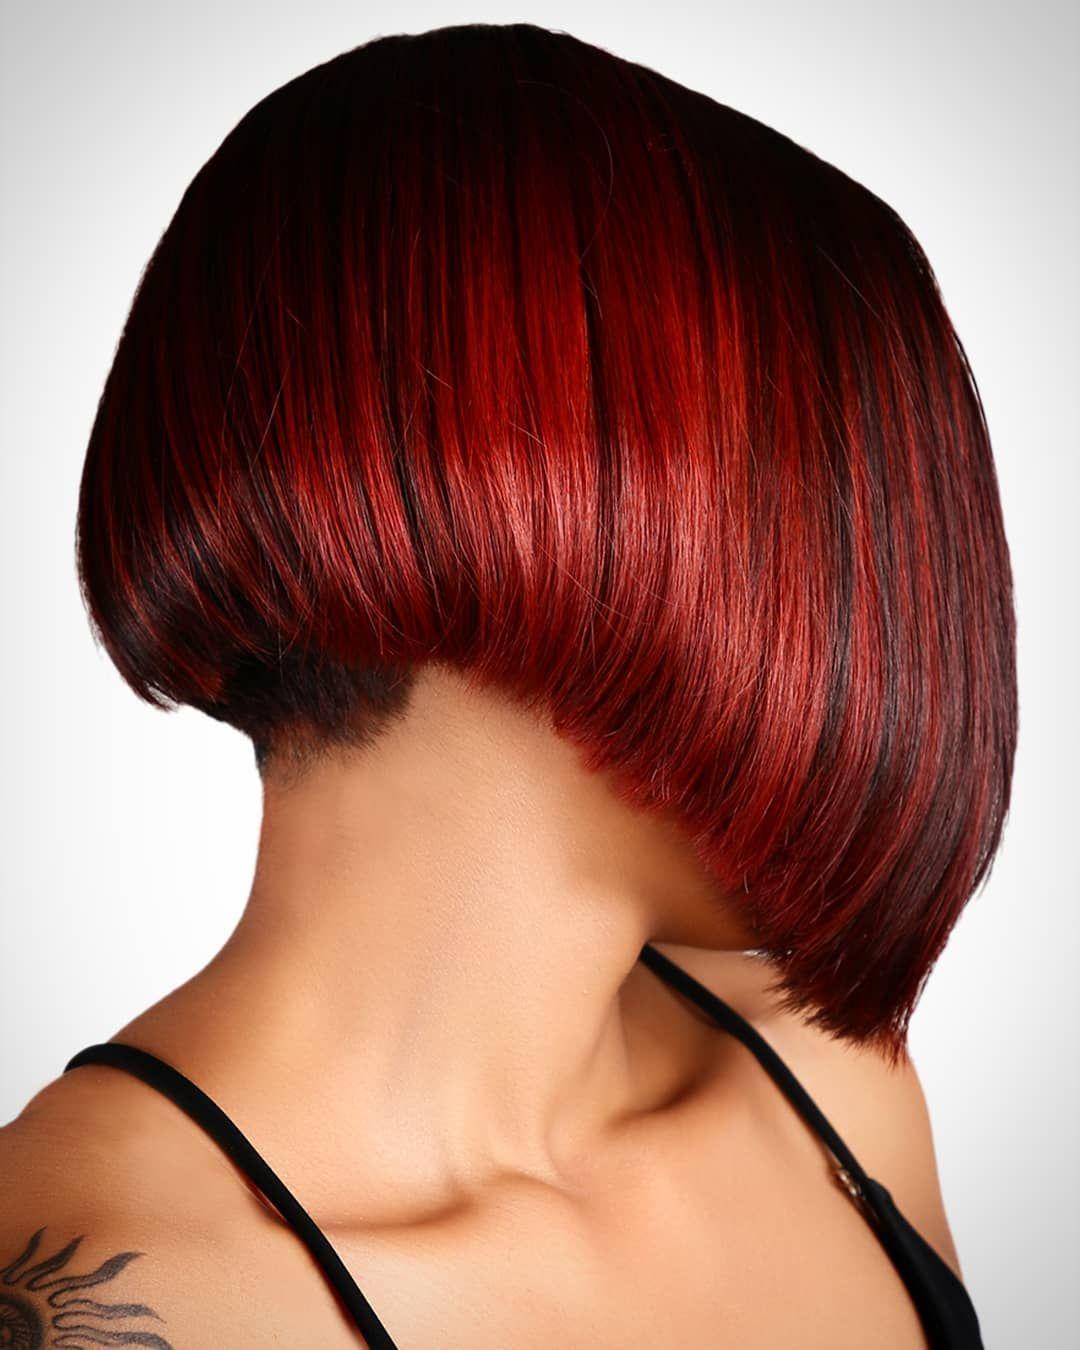 Instagram Photo By Koyena Biswas Koyena Biswas Webstagram Hair Styles Matrix Hair Color Bob Hairstyles